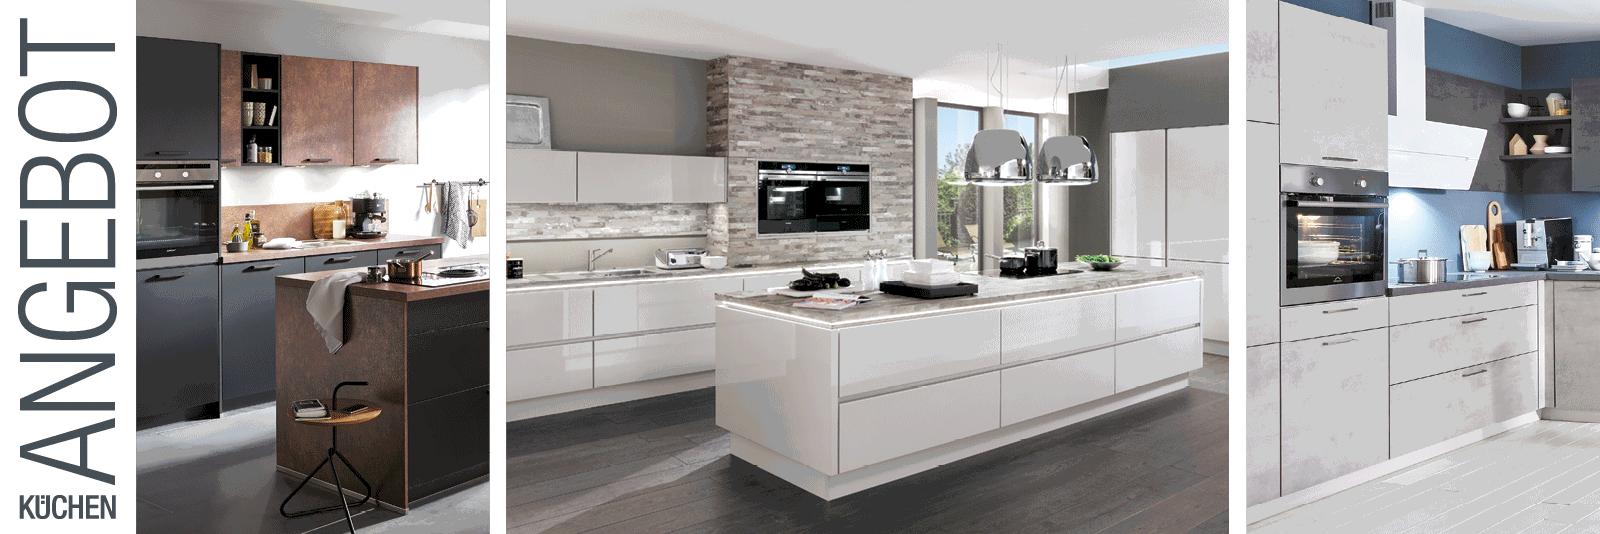 Hausgeräte, Elektrogeräte & Küchenstudio - electroplus ...